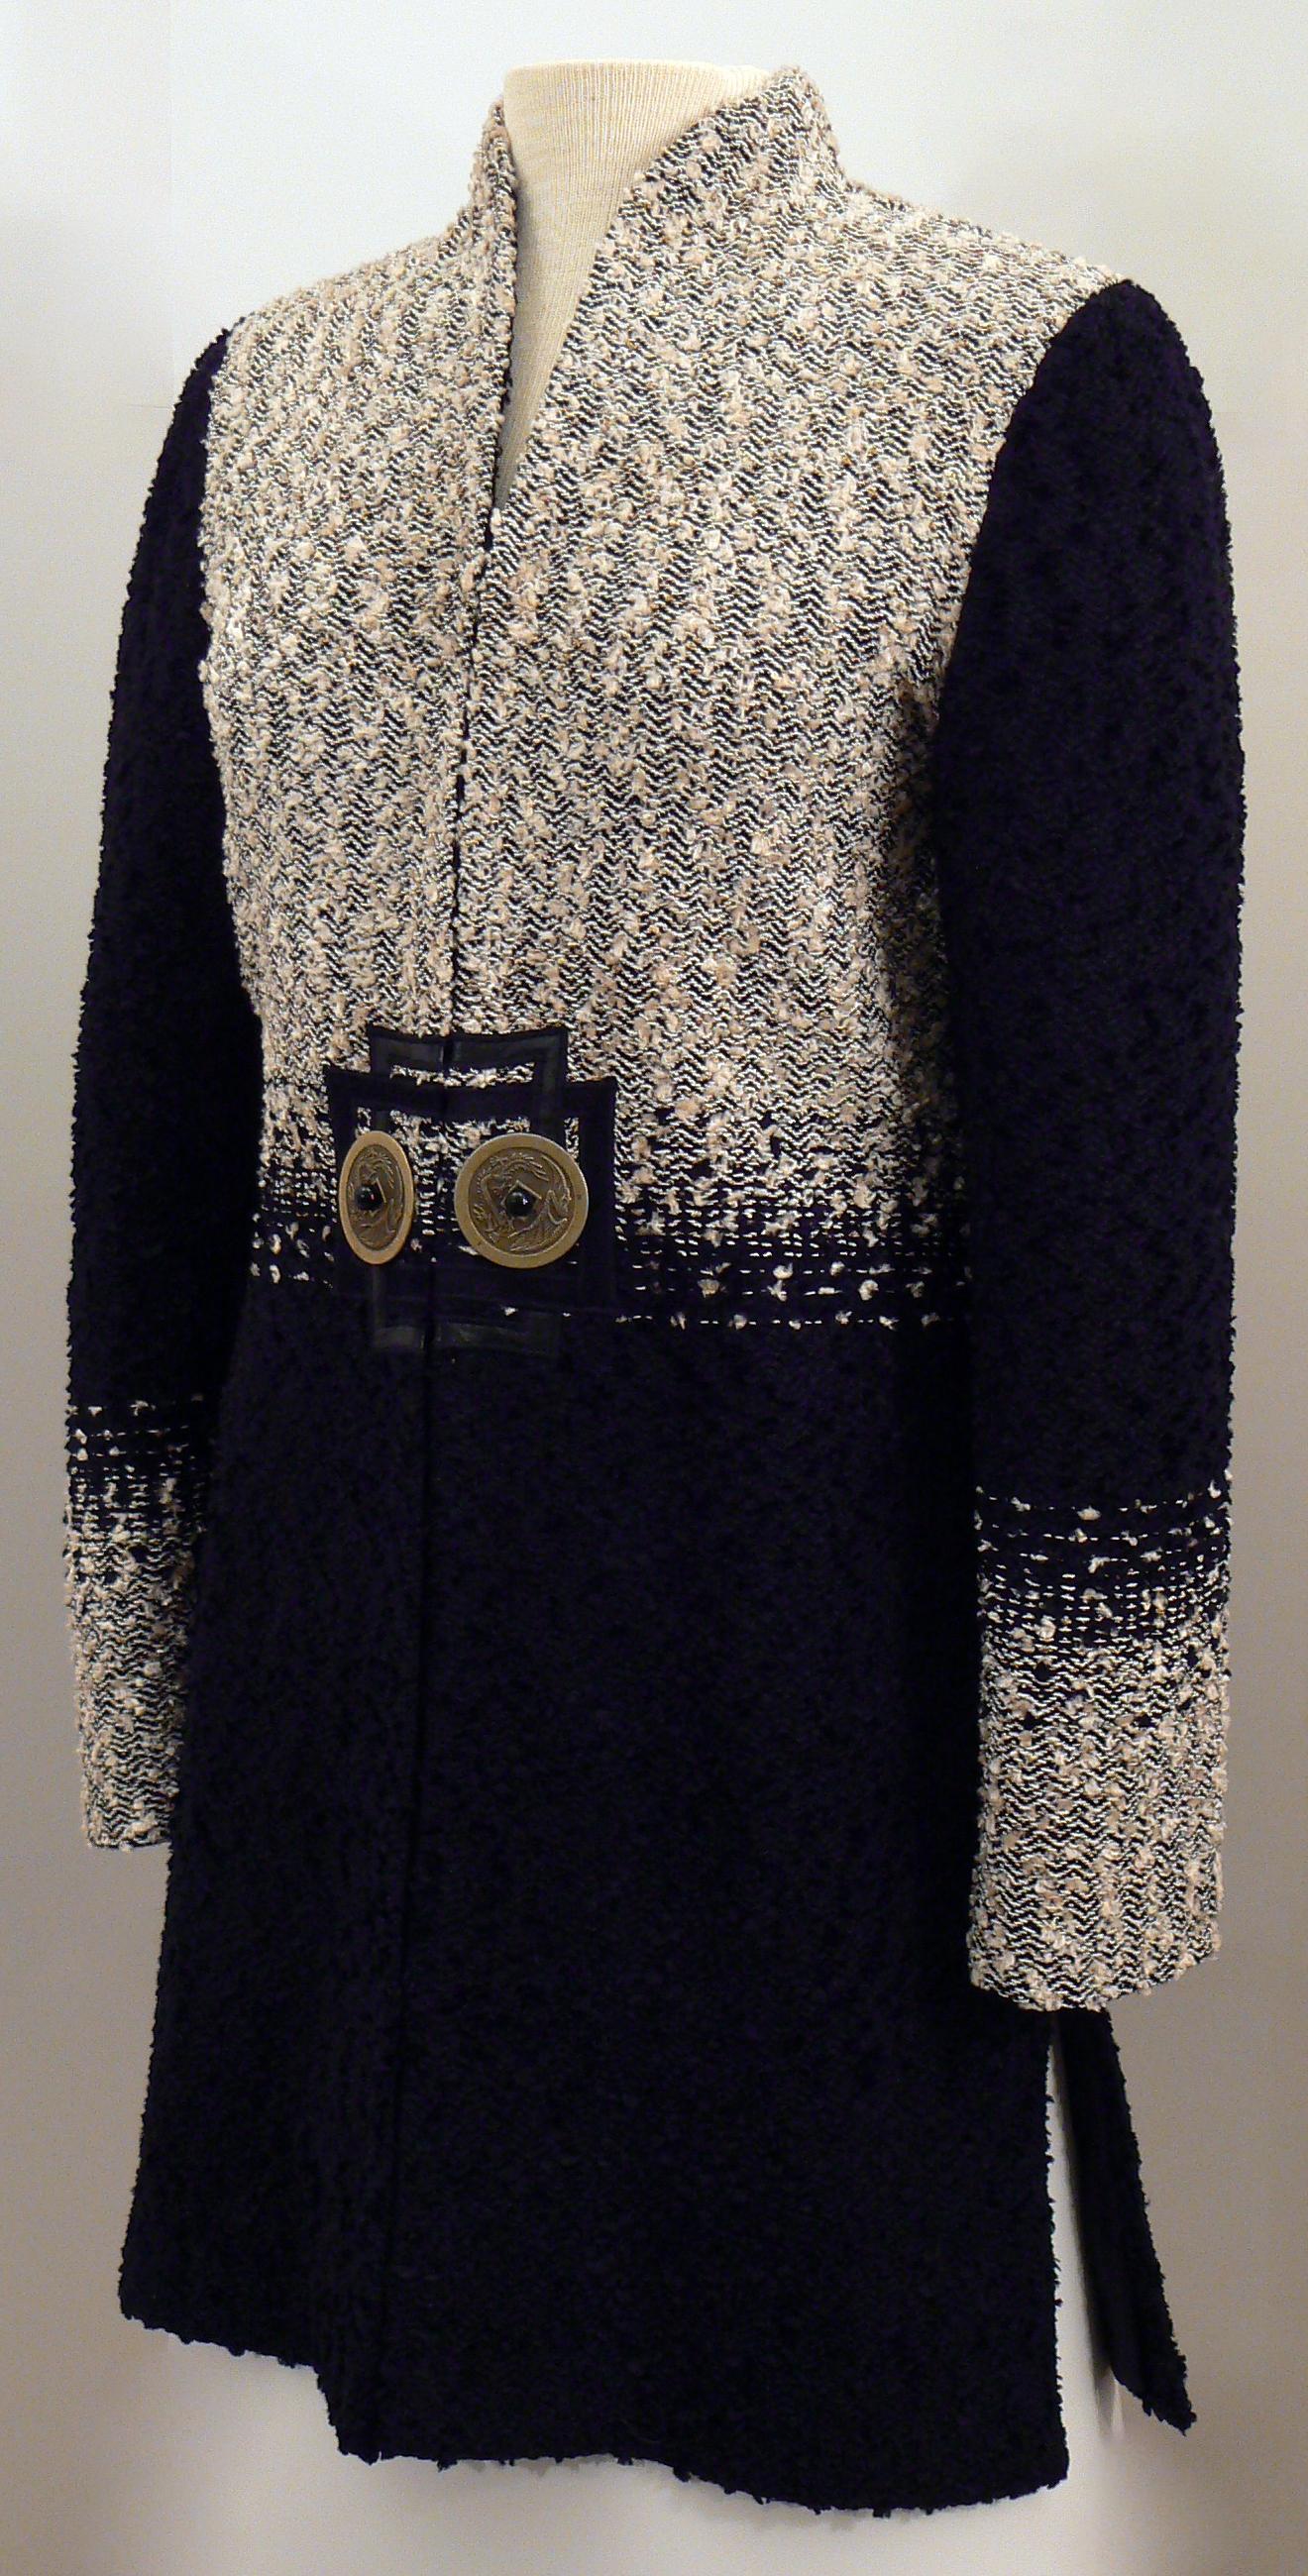 Handwoven Clothing, Coats, Kathleen Weir-West, 4-001.JPG